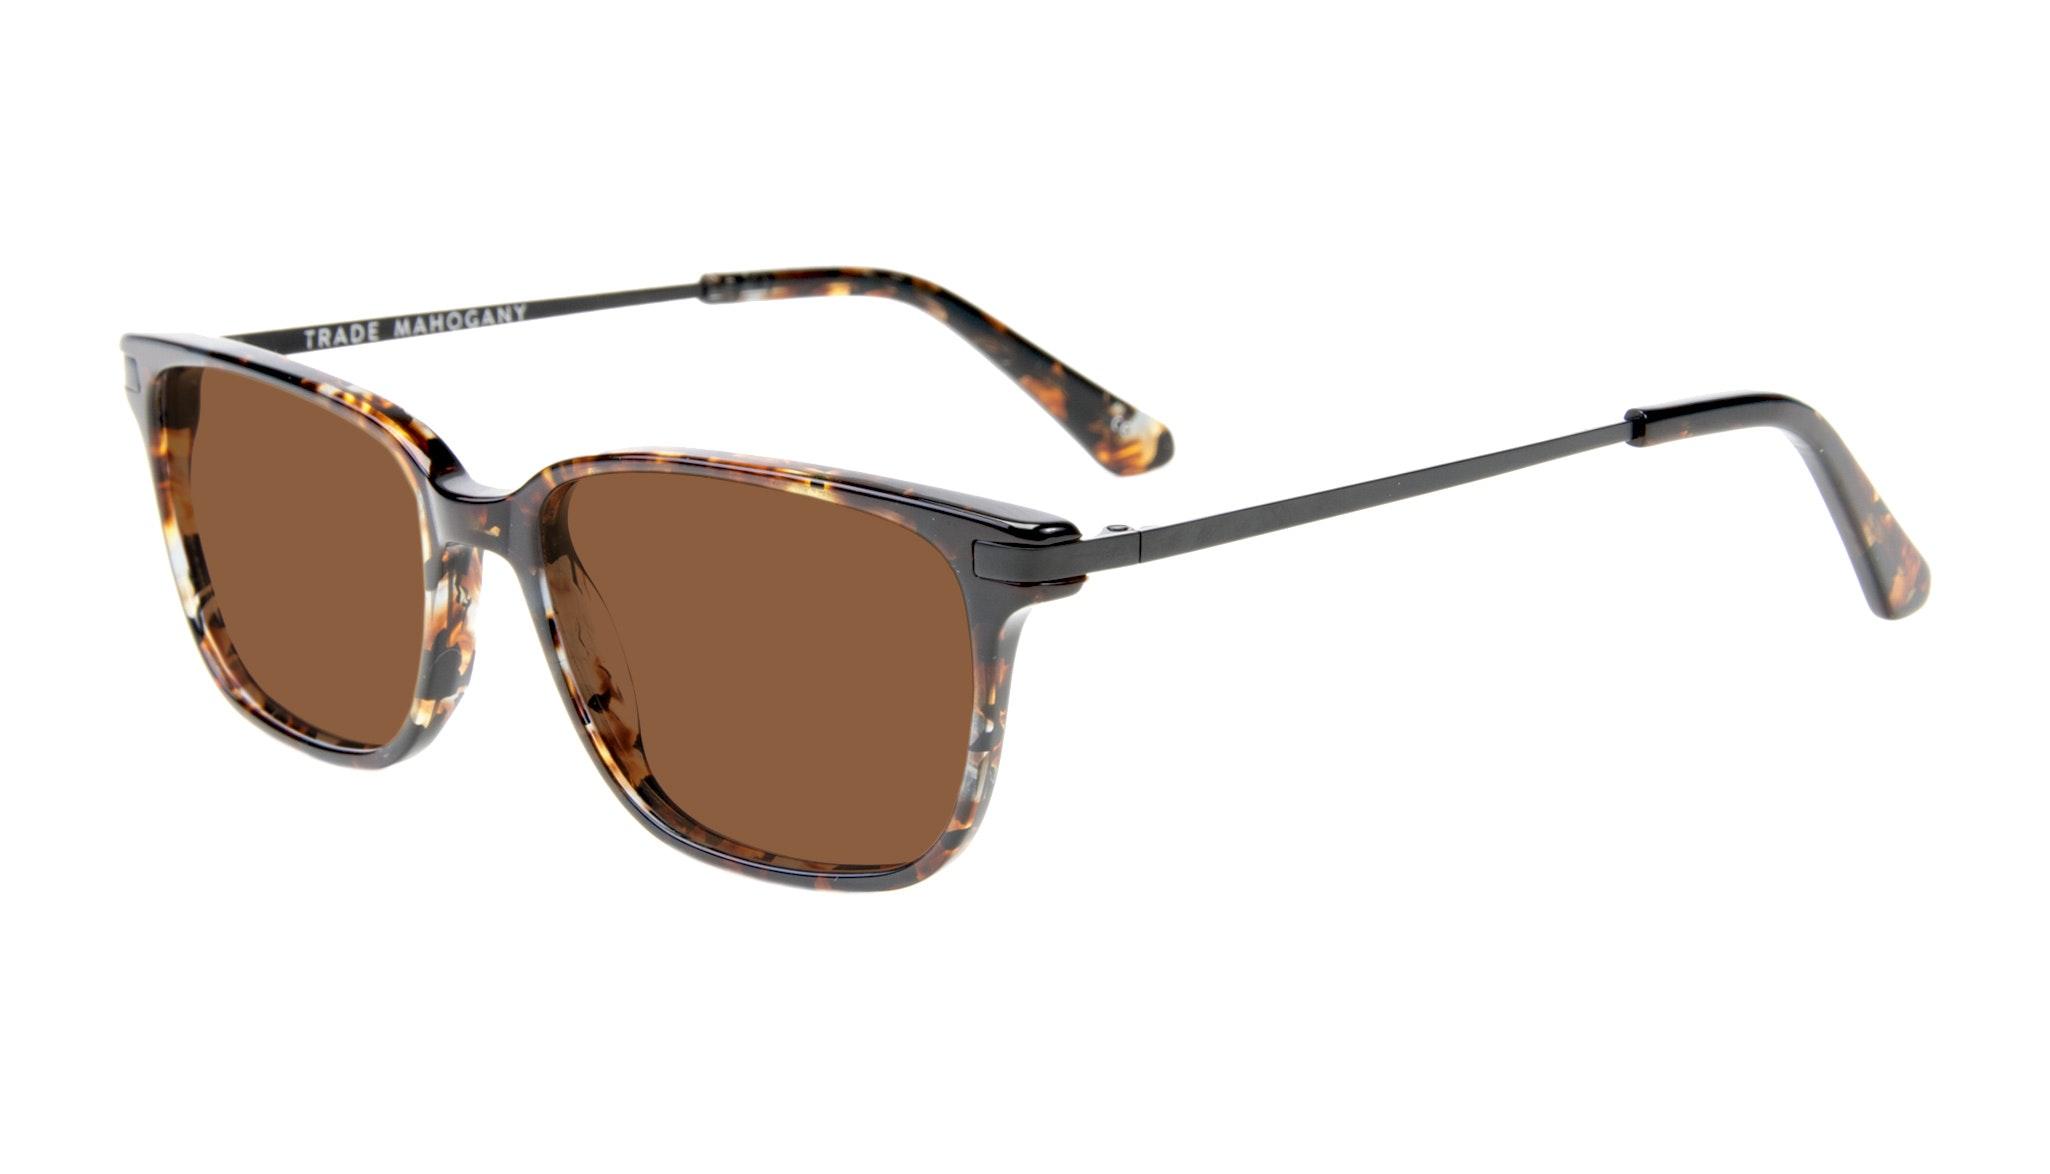 Affordable Fashion Glasses Rectangle Sunglasses Men Trade Mahogany Tilt